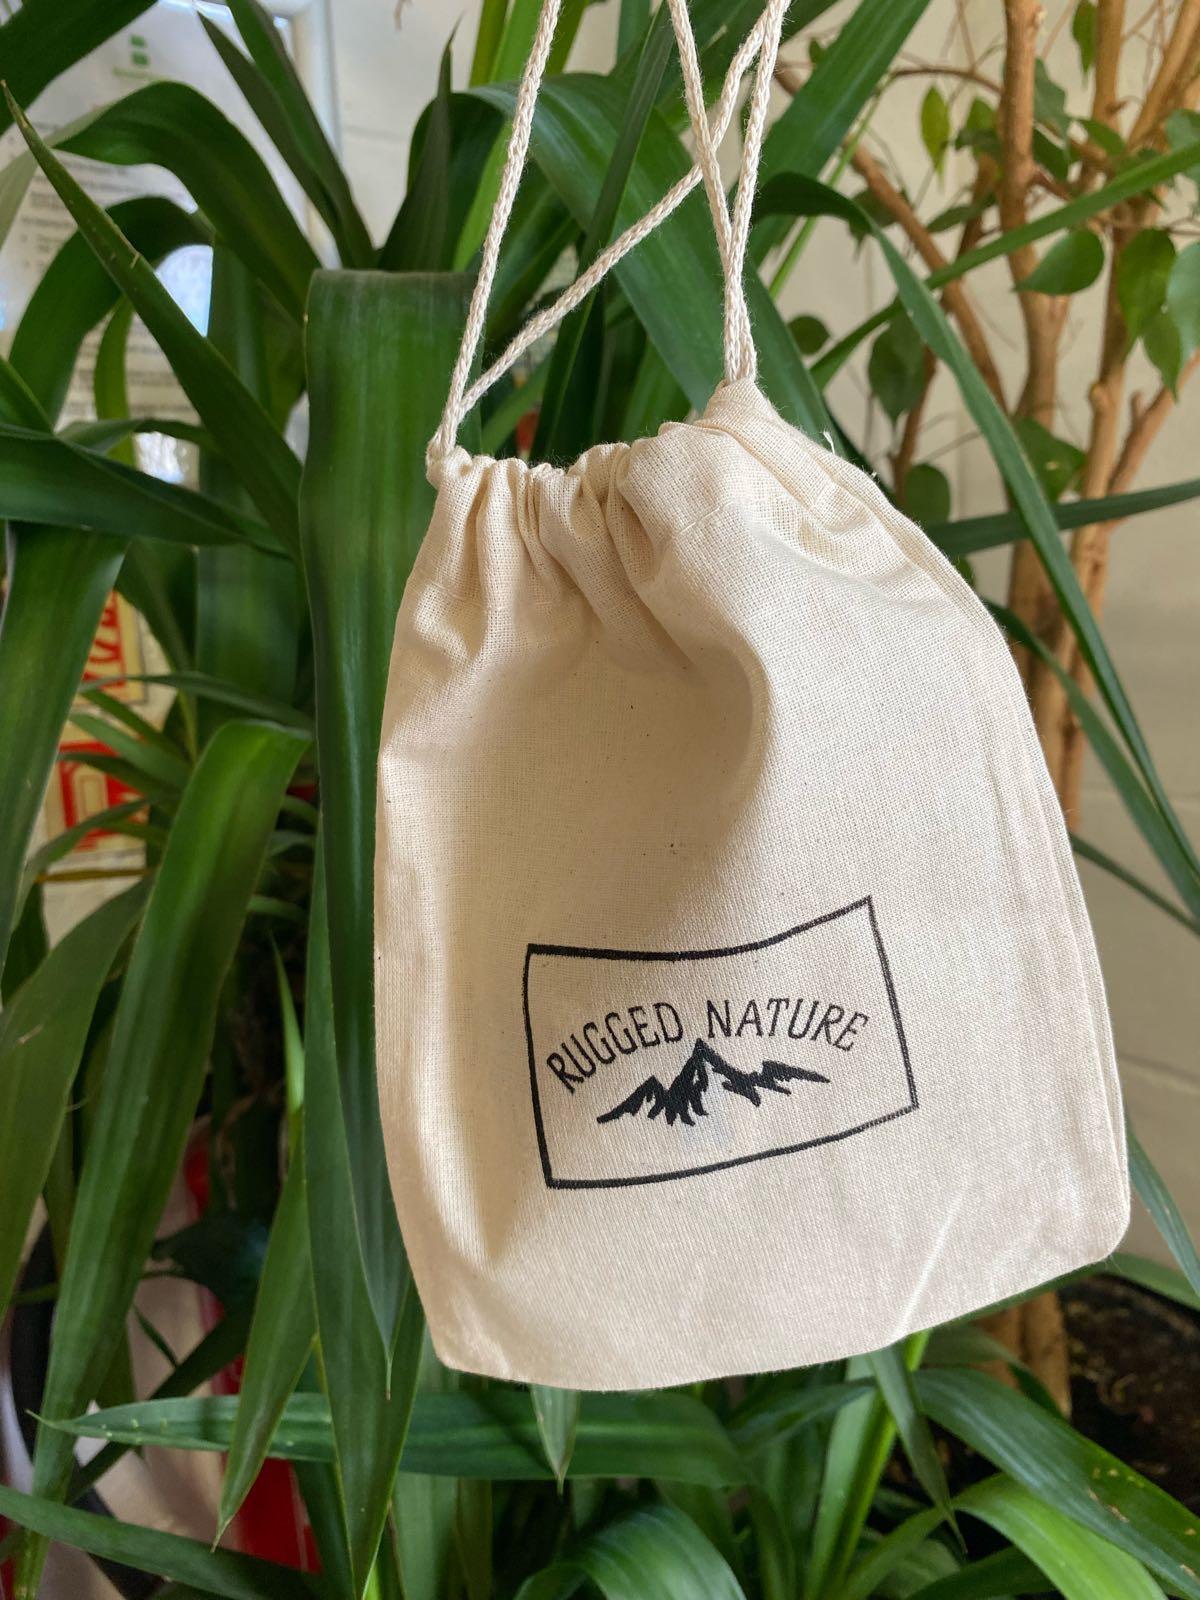 Cotton Drawstring Bag | Rugged Nature